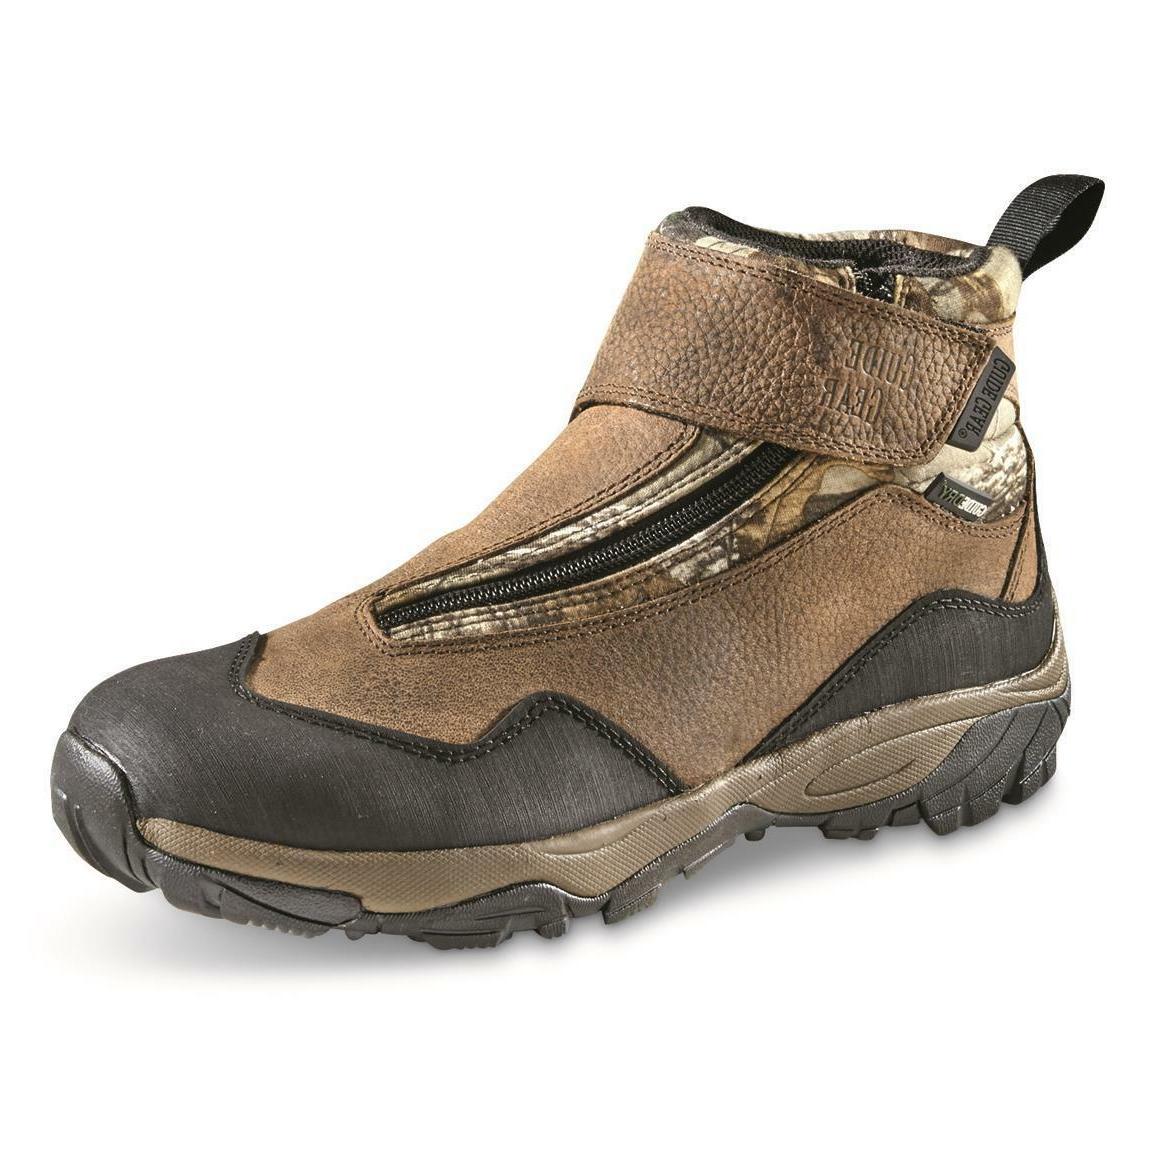 GUIDE GEAR Men's Silver Ridge Waterproof Zip Up Hunting Boot